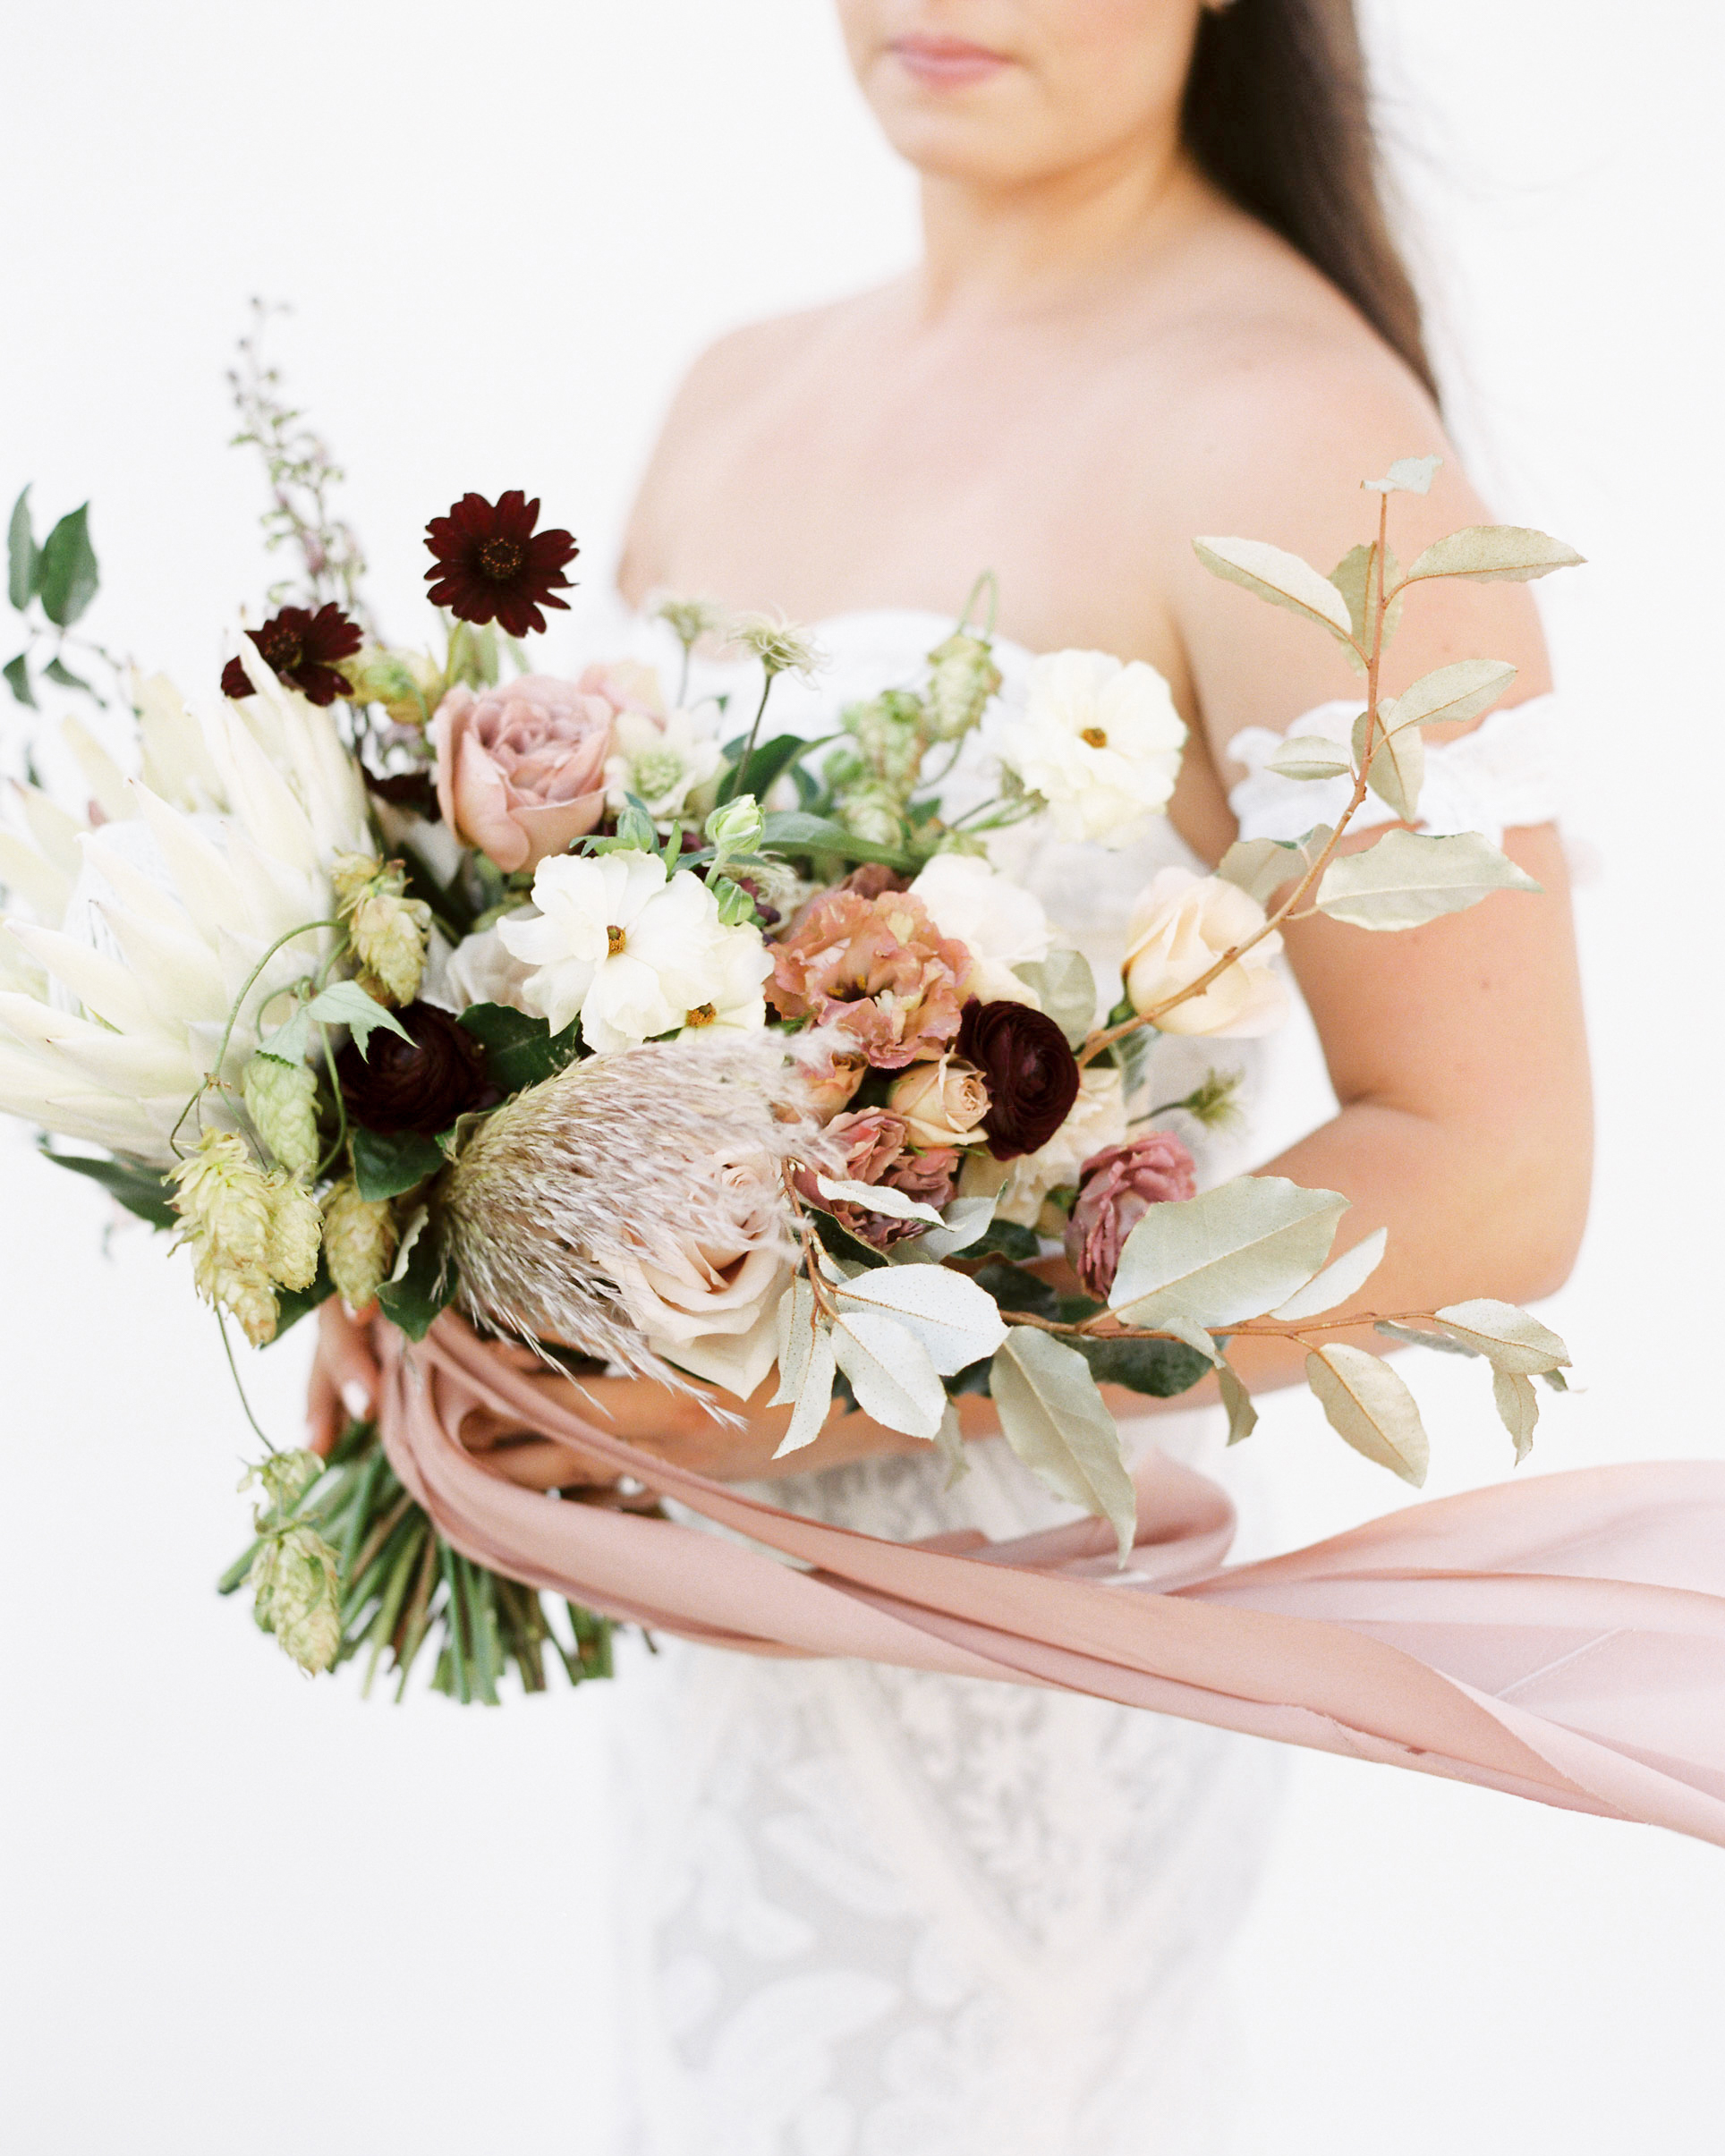 ribbon wedding ideas pink ribbon tied around bridal bouquet